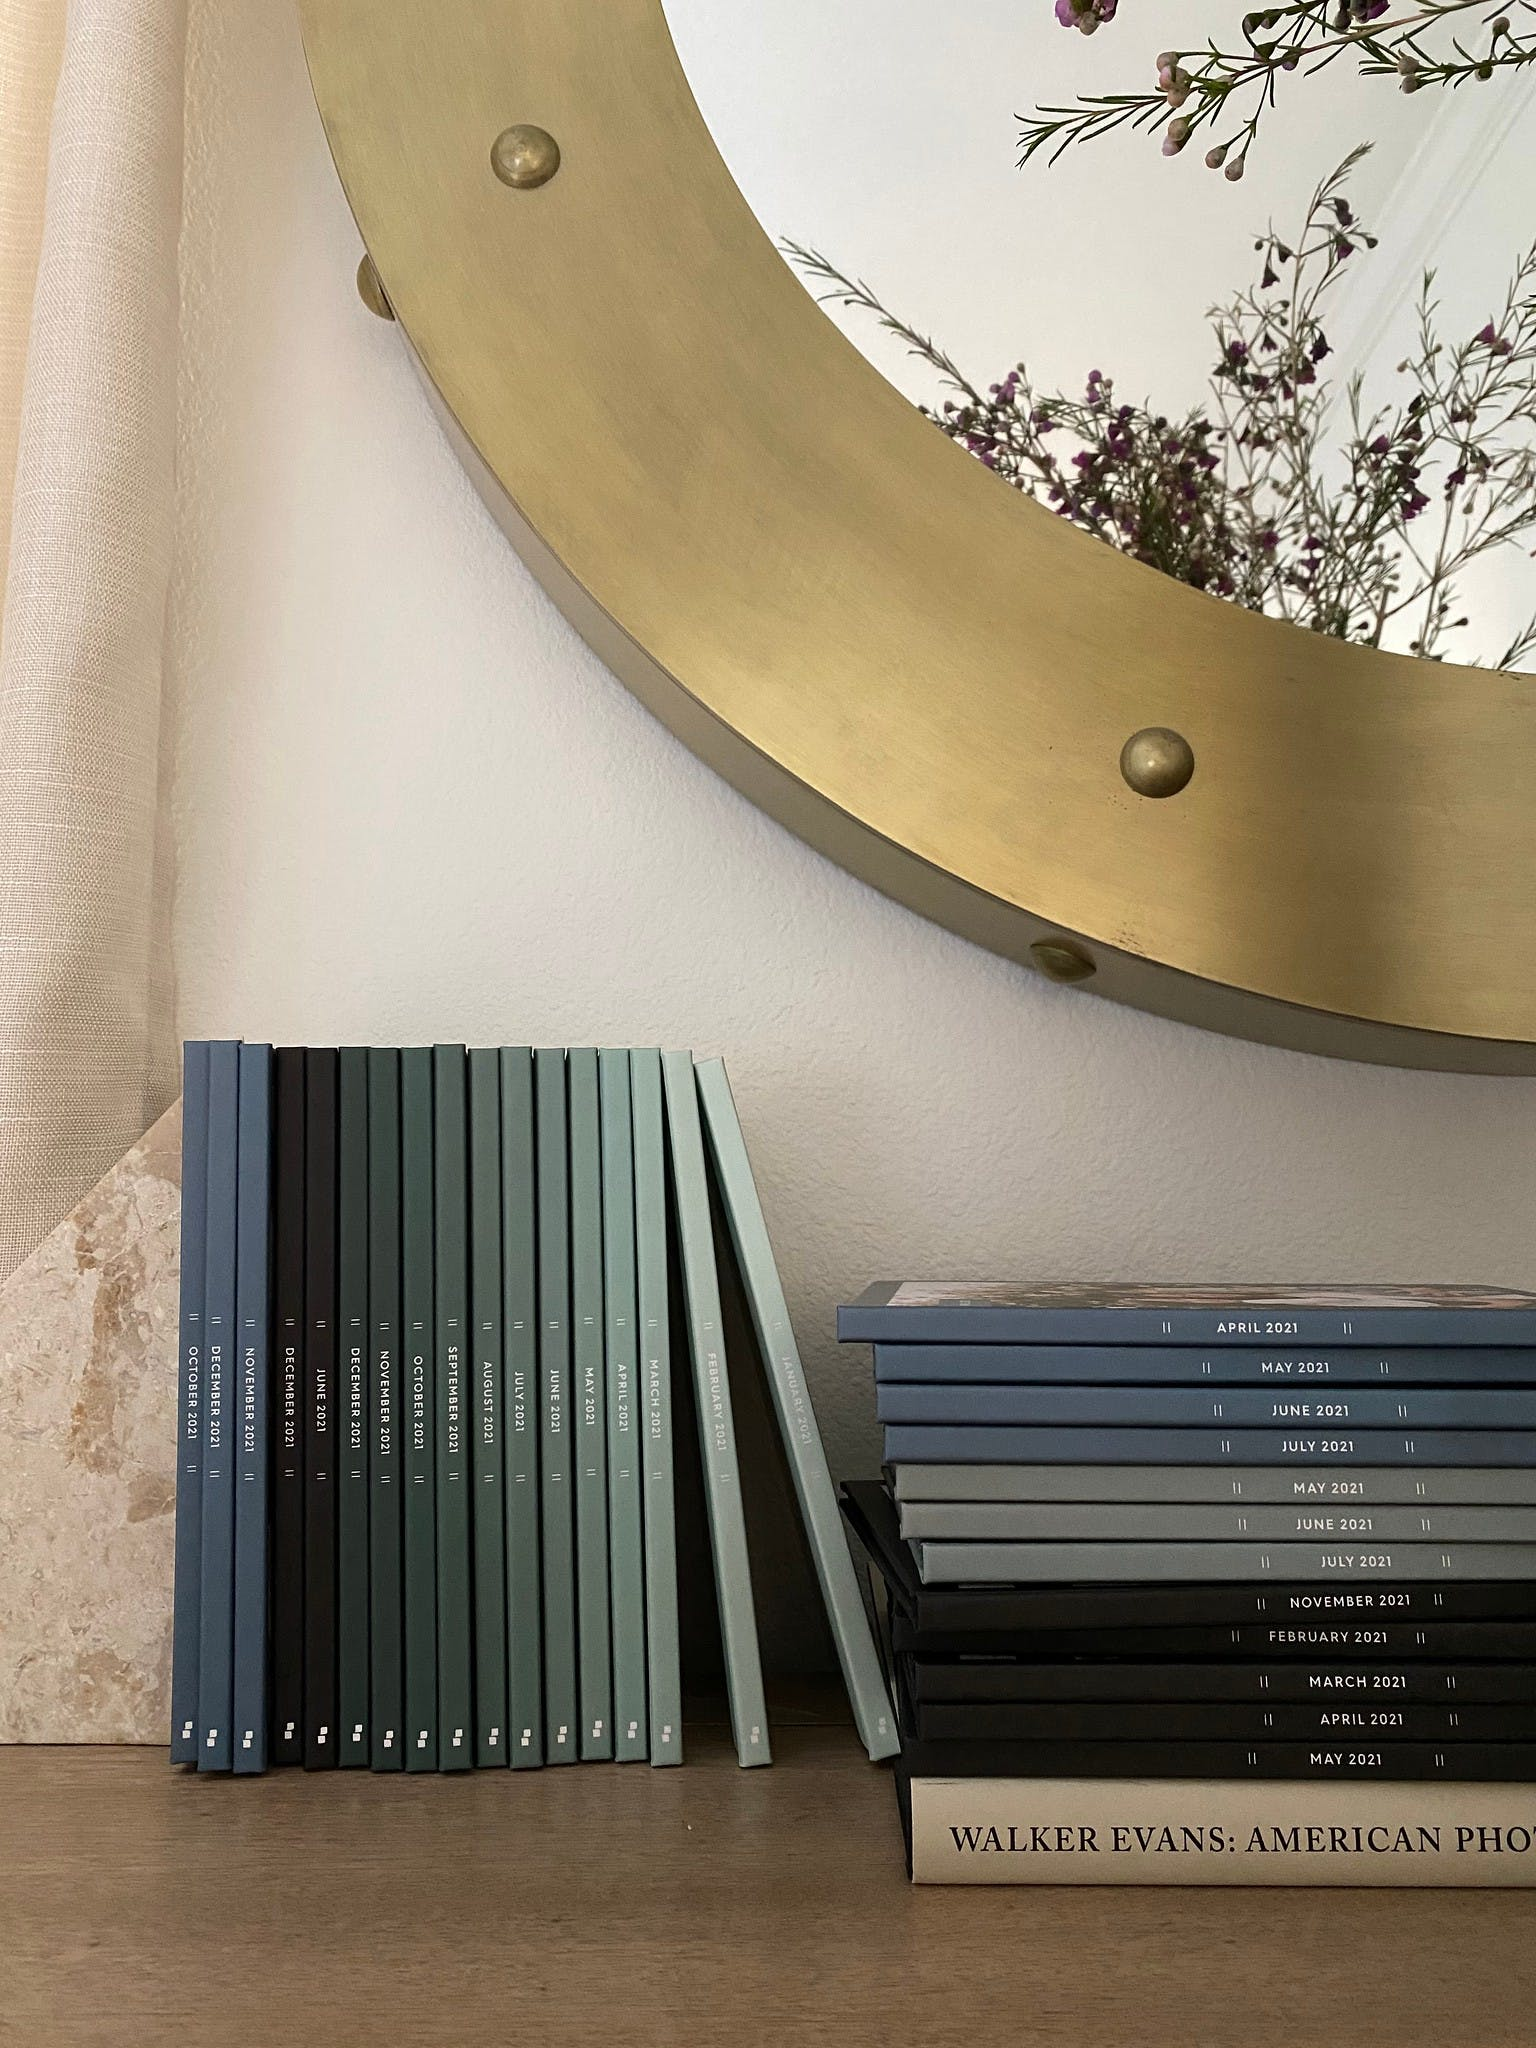 Monthbook on bookshelf